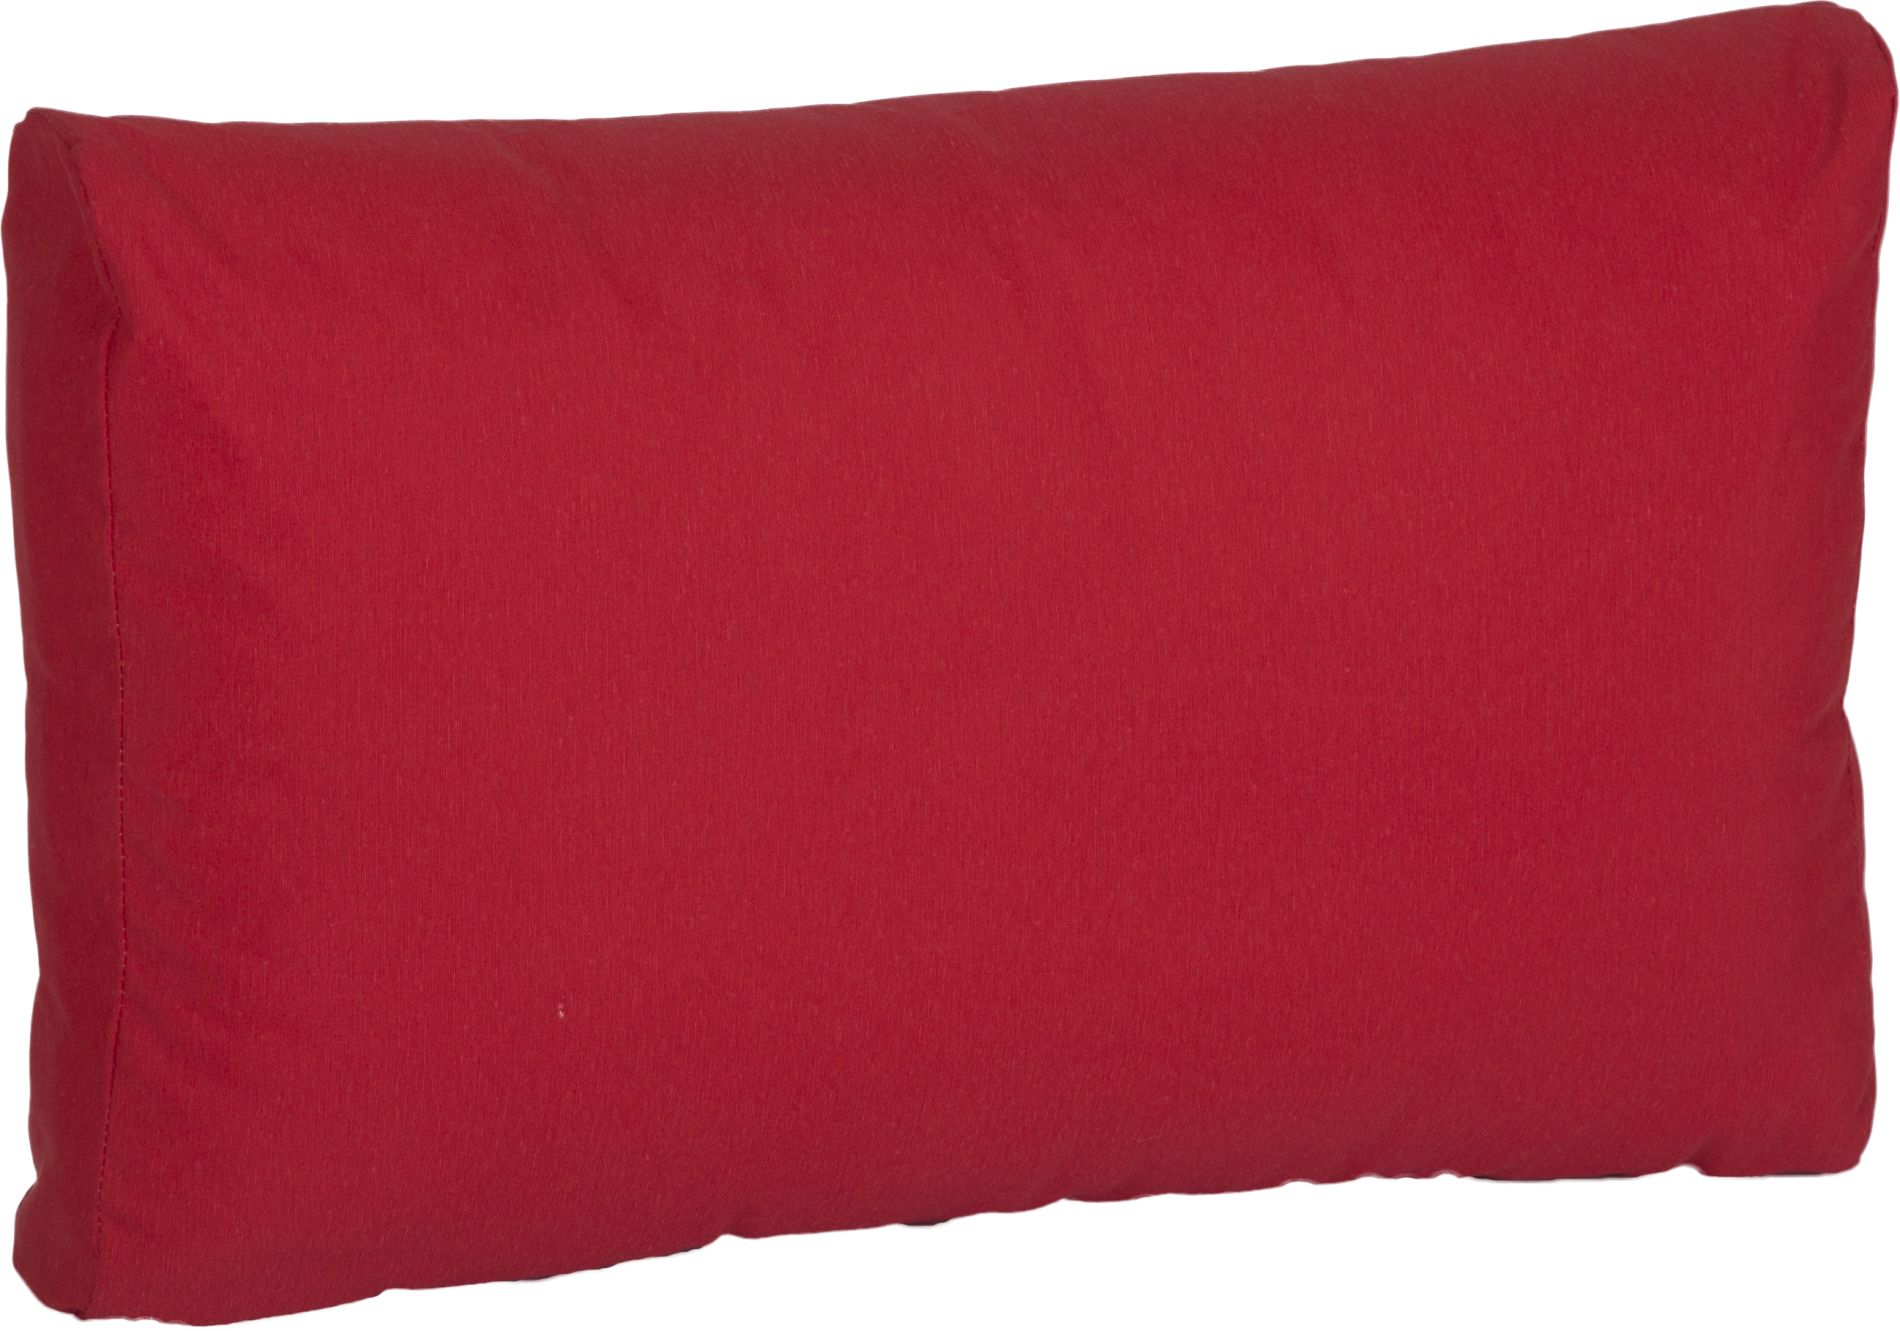 acamp Weekend Rückenkissen für Basiselement rot 70 x 42 x 22 cm